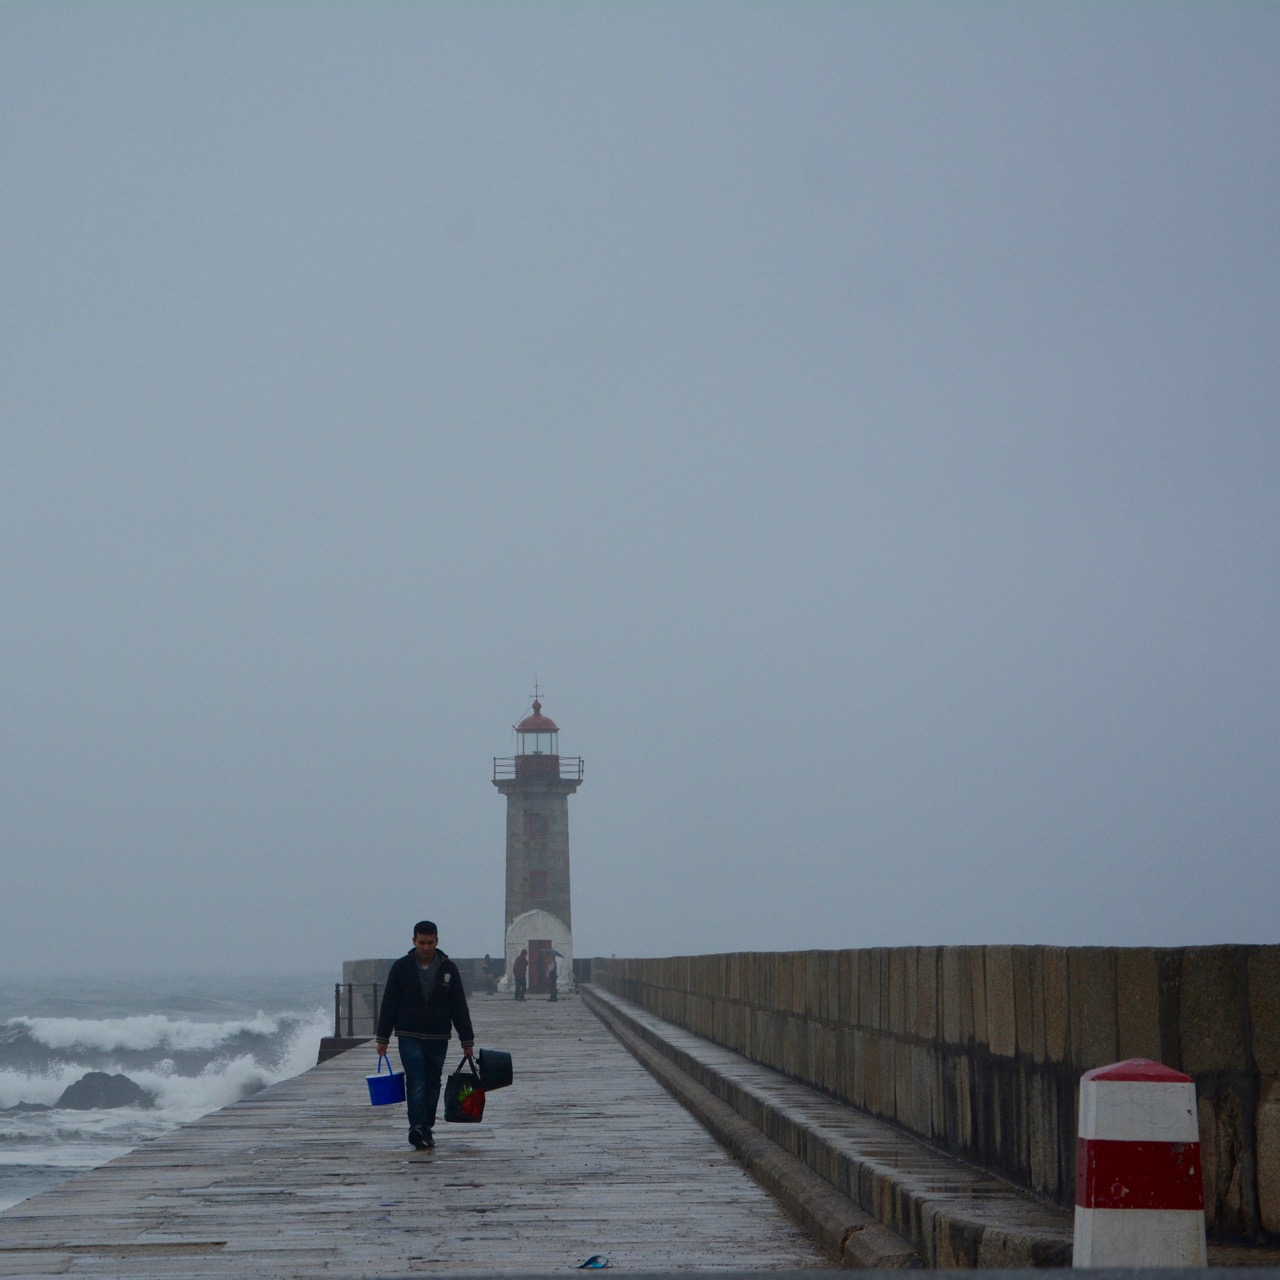 travel with kids children porto portugal light house